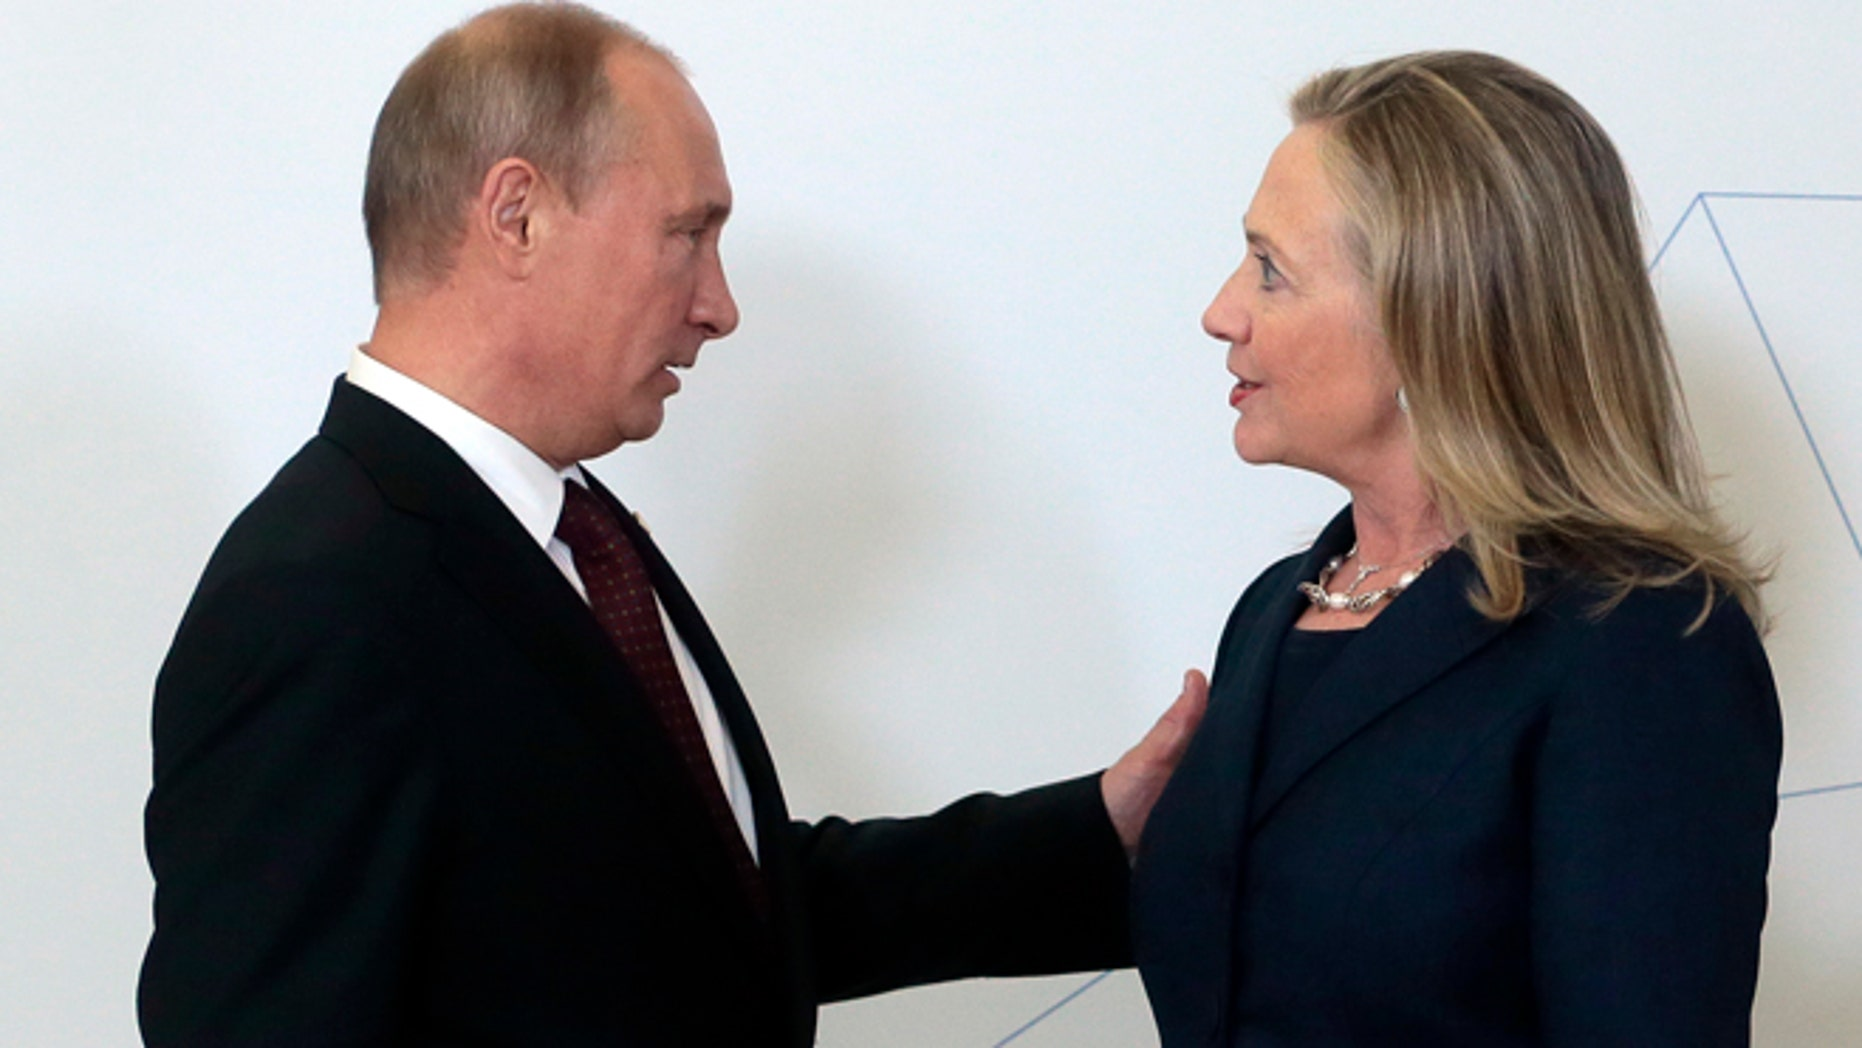 Sept. 8, 2012: Russian President Vladimir Putin, left, meets U.S. Secretary of State Hillary Rodham Clinton on her arrival at the APEC summit in Vladivostok, Russia.